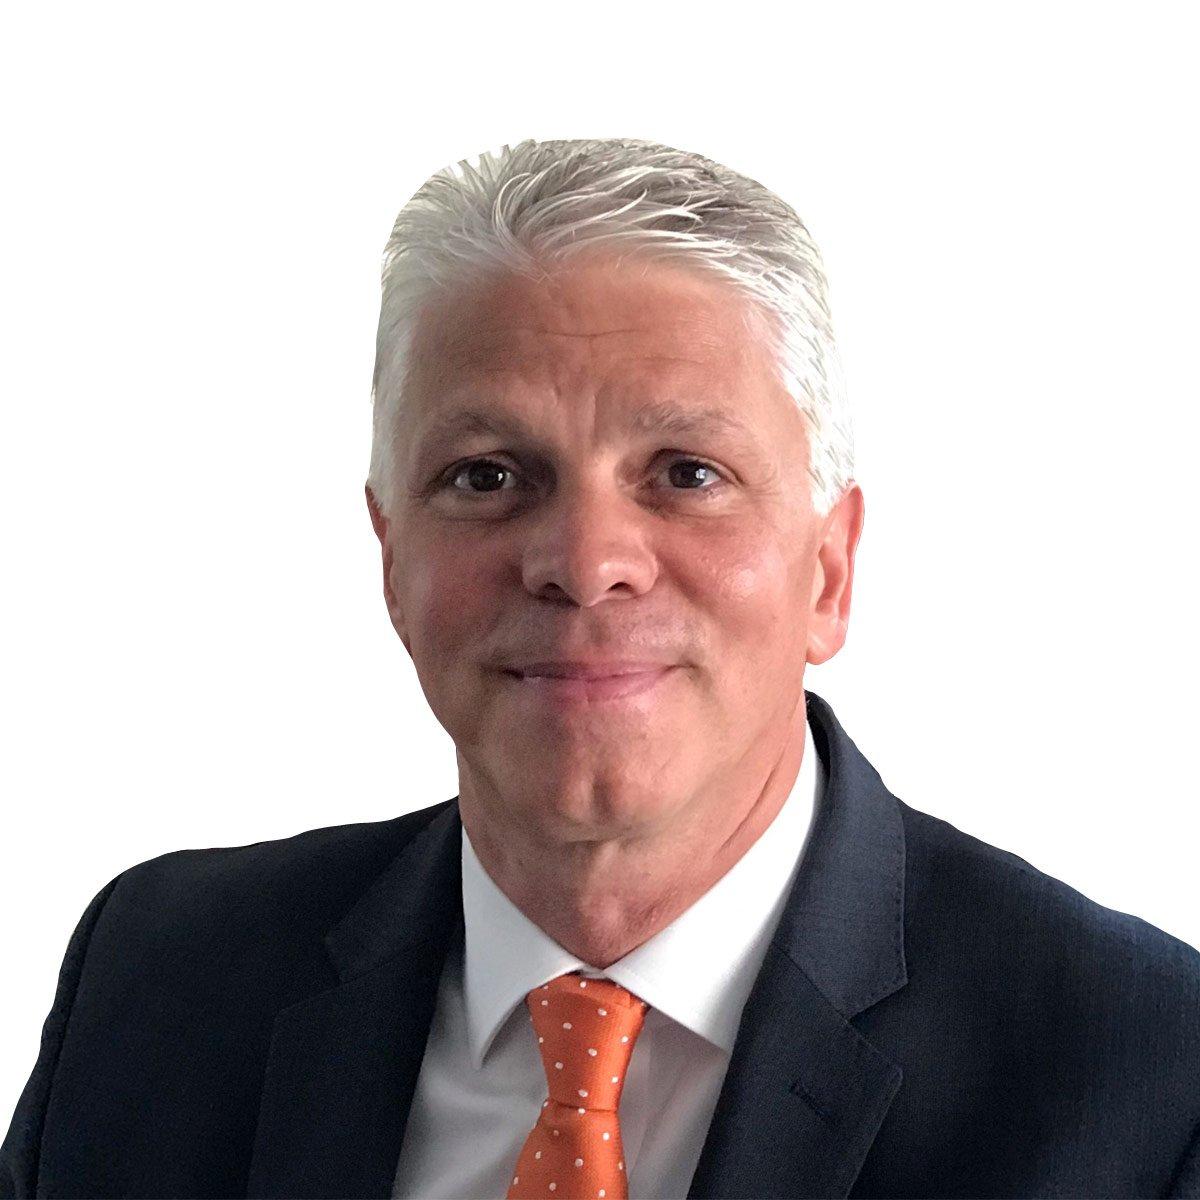 Dominic Hagger, President, Tatum Reinsurance Intermediary, LLC